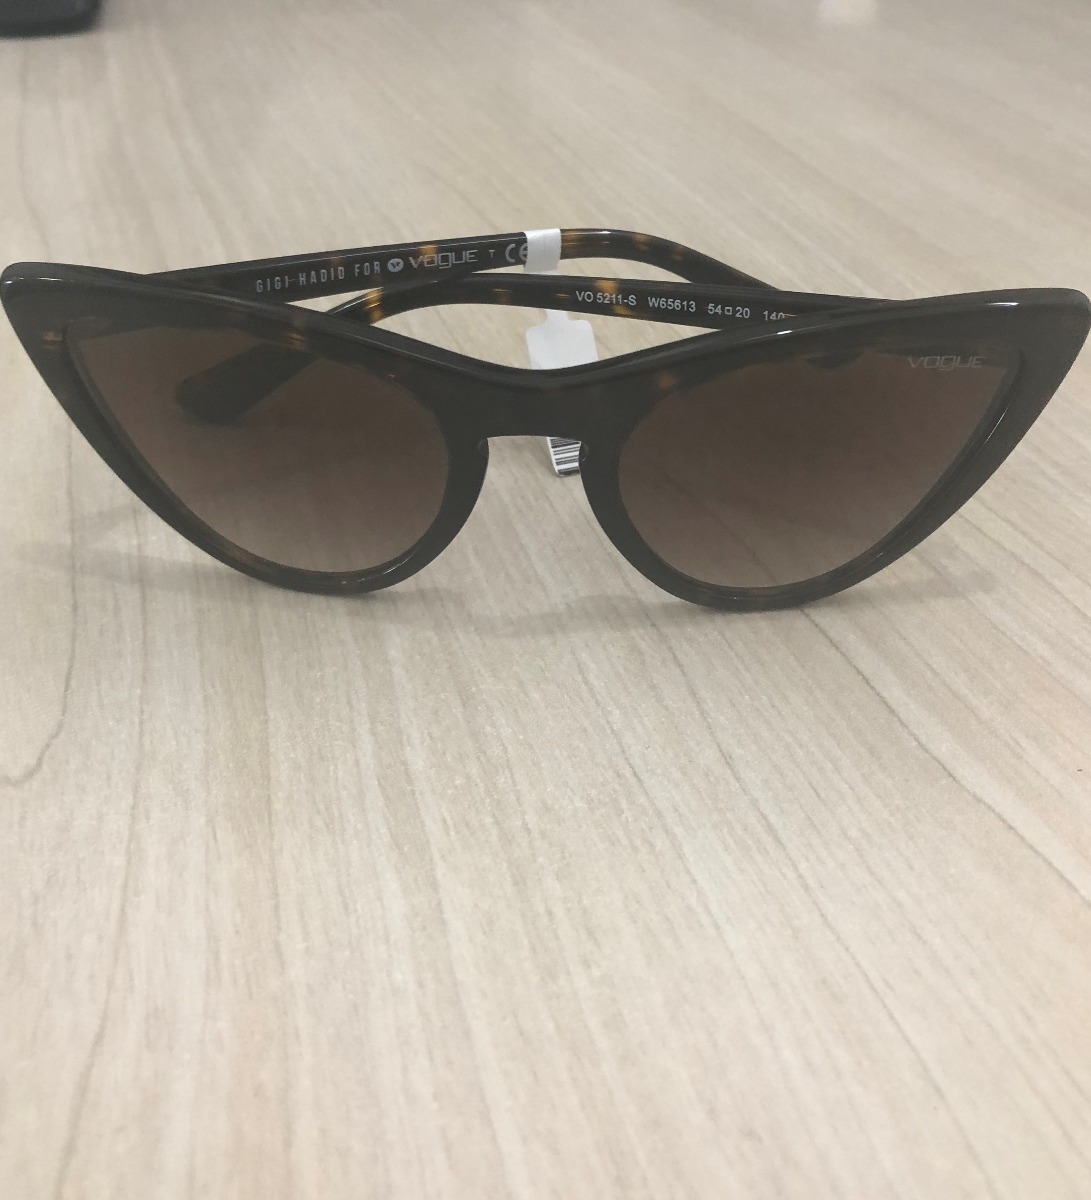 d76a217c9 Oculos De Sol Vogue Gigi Hadid Original - R$ 419,00 em Mercado Livre